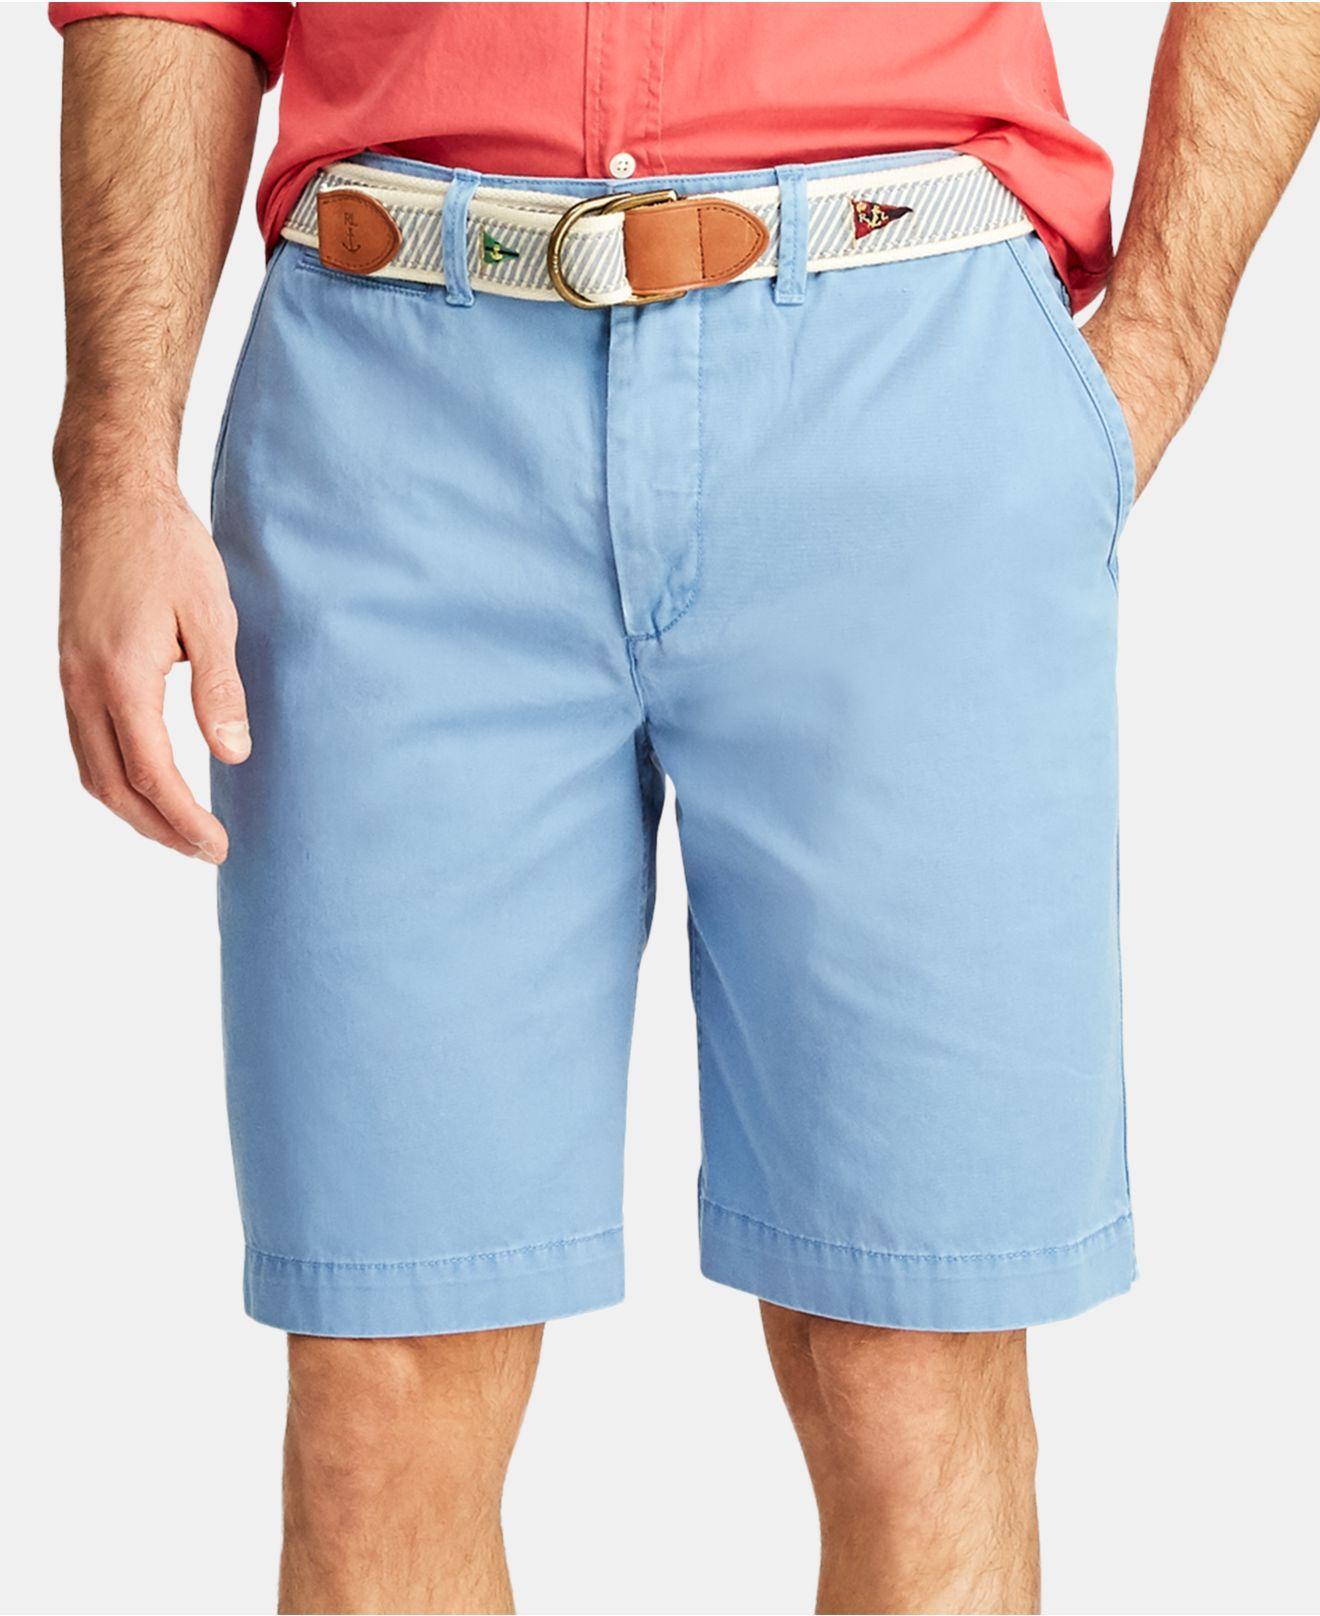 70d9c8d3eeb0 Polo Ralph Lauren. Men's Blue Big & Tall Classic Fit Cotton Chino Shorts